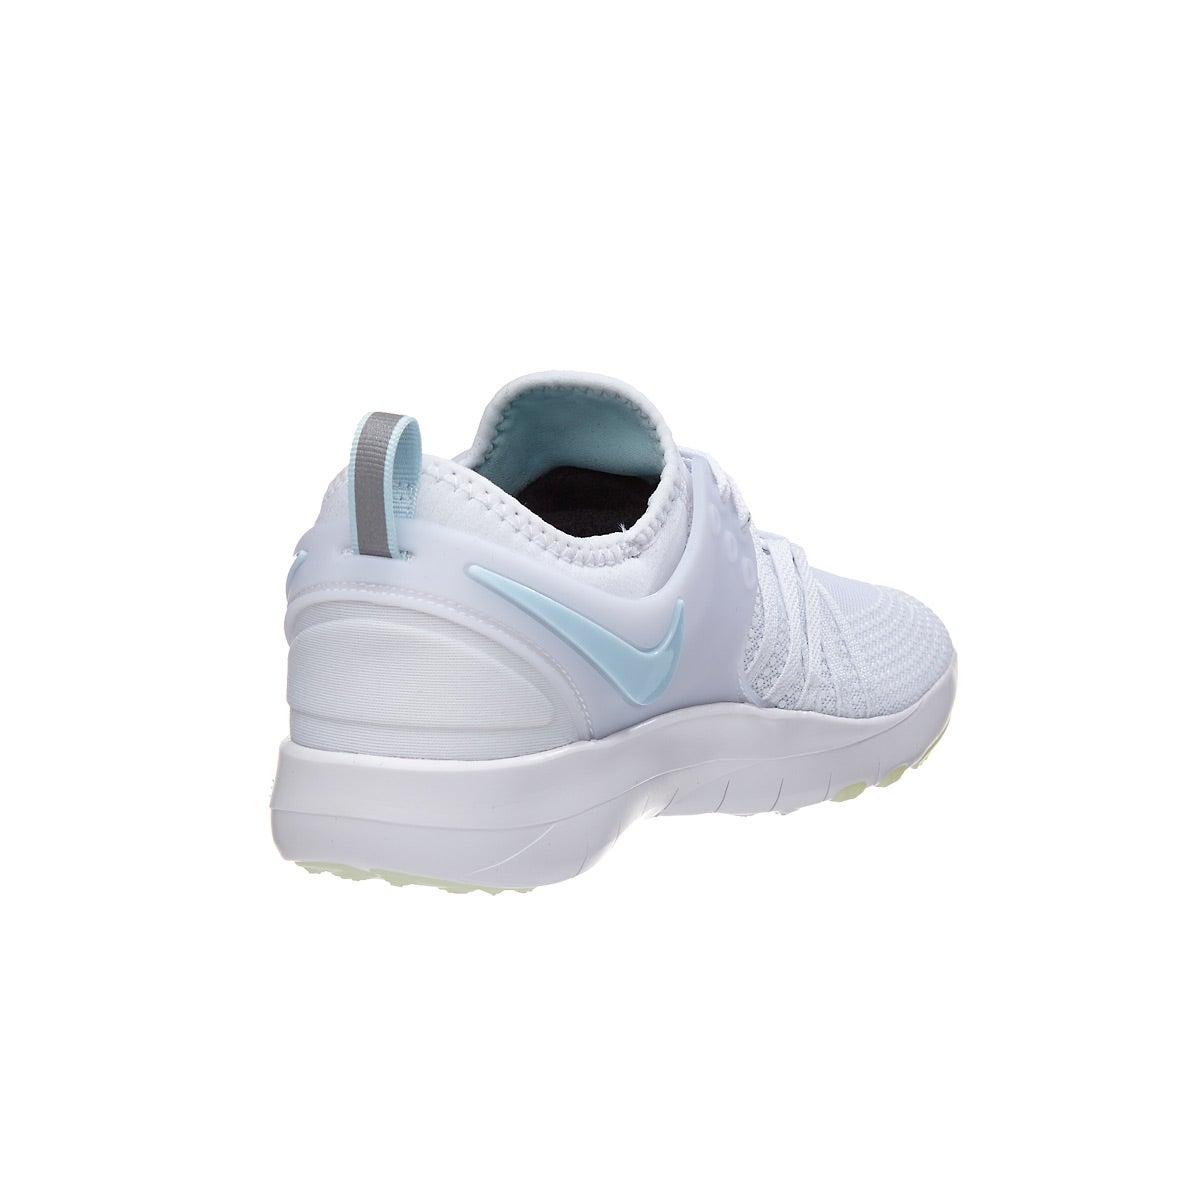 6819fd9cdaaa3 Nike Free TR7 Reflect White Glacier Blue Women s Shoe 360° View